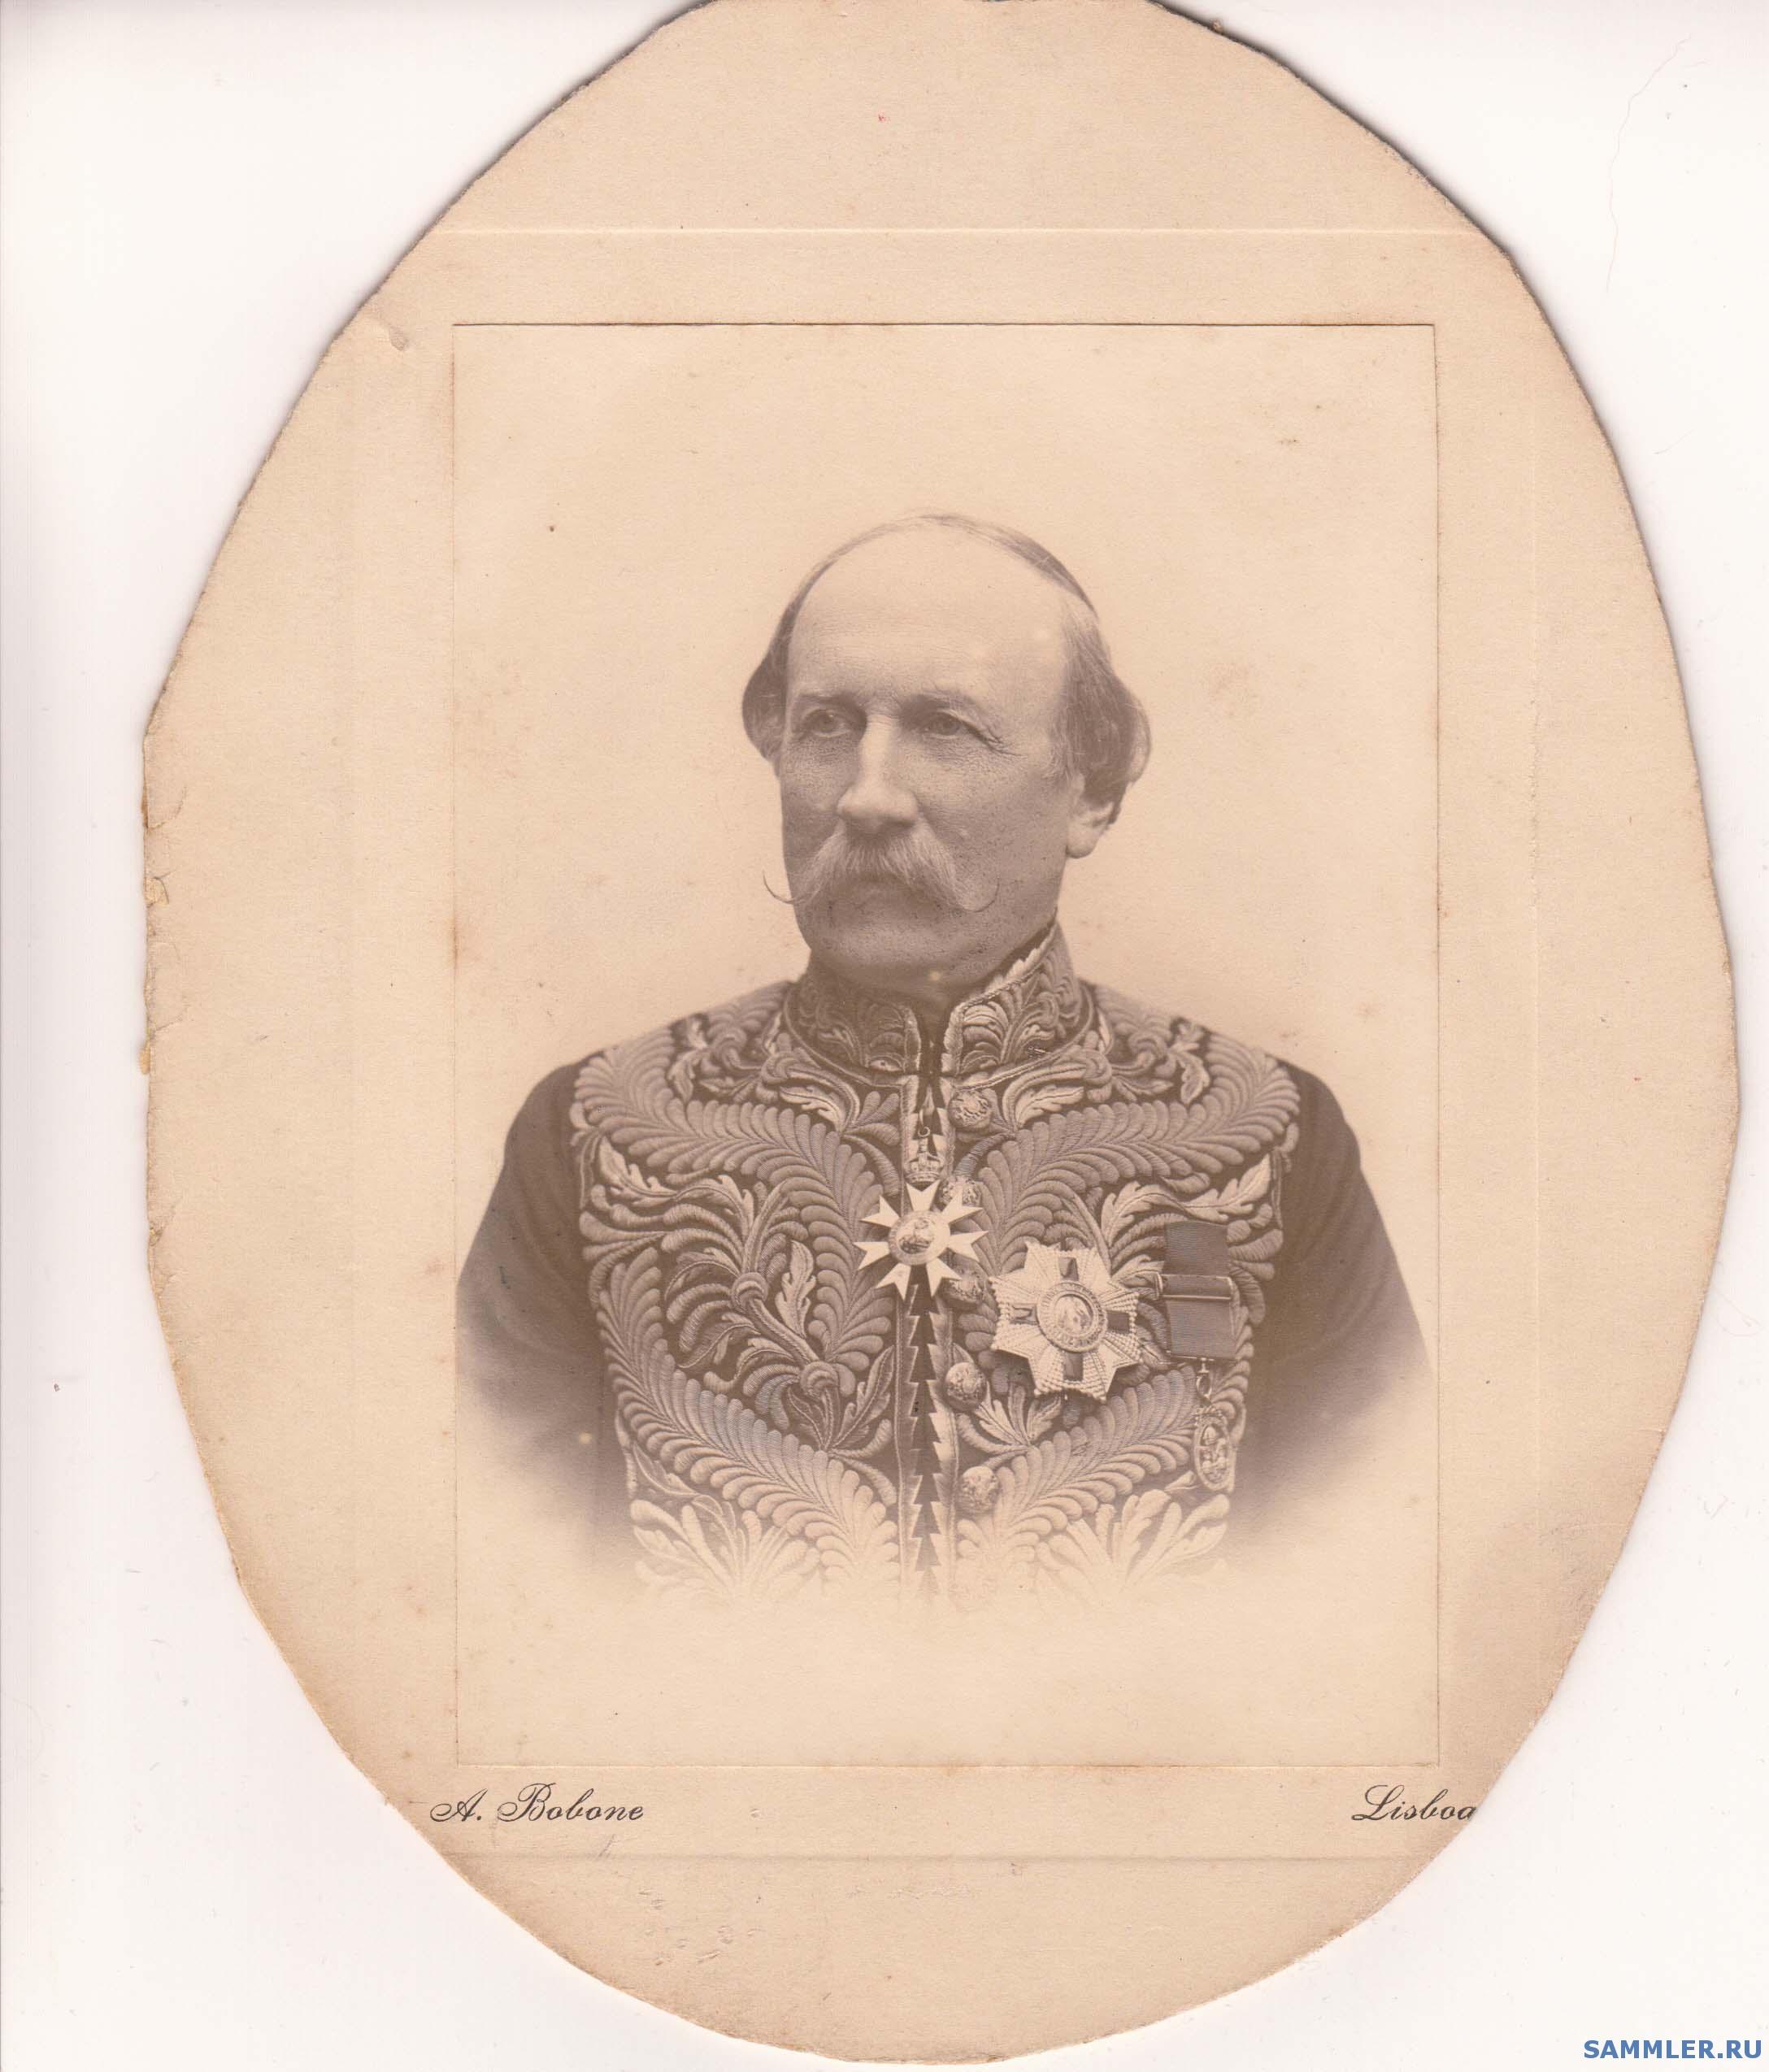 Sir_Francis_Hyde_Villiers_GCMG_GCVO_CB_PC__13_August_1852___18_November_1925__.jpg